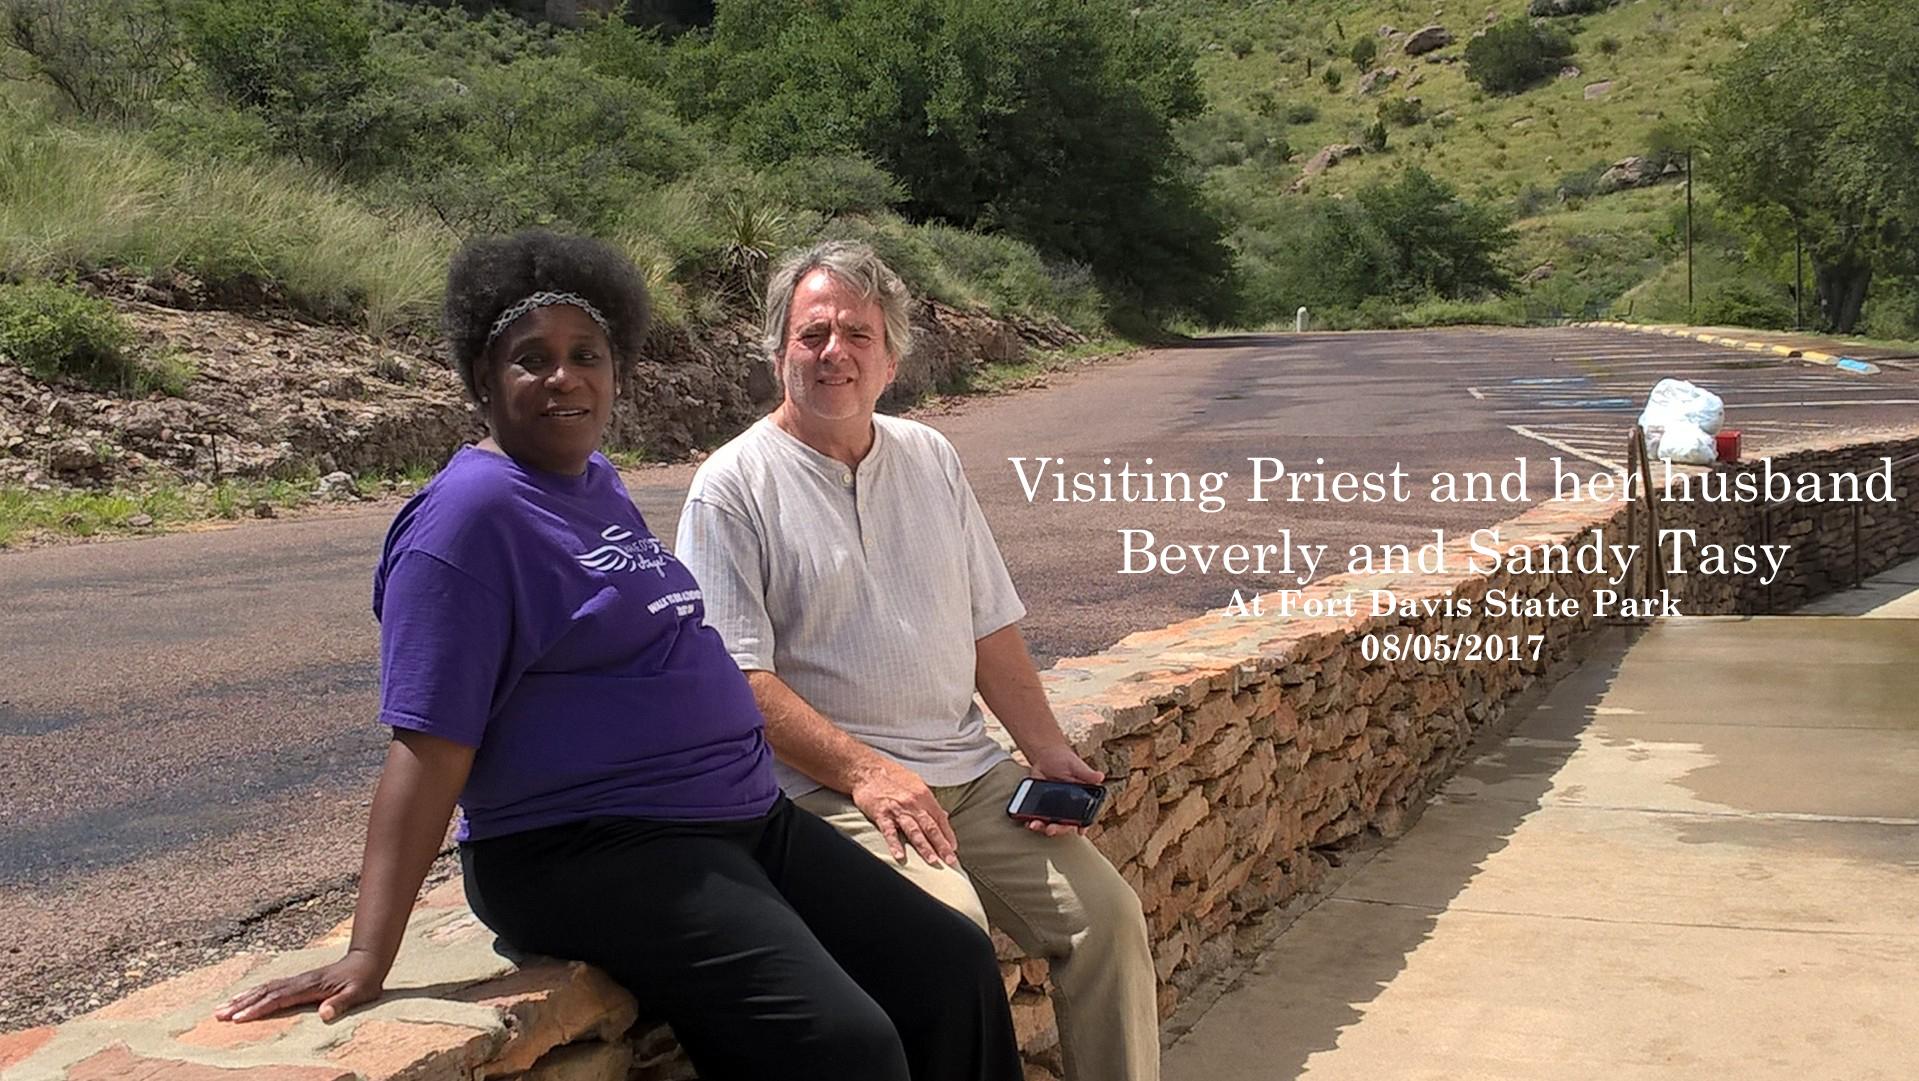 Visiting Priest